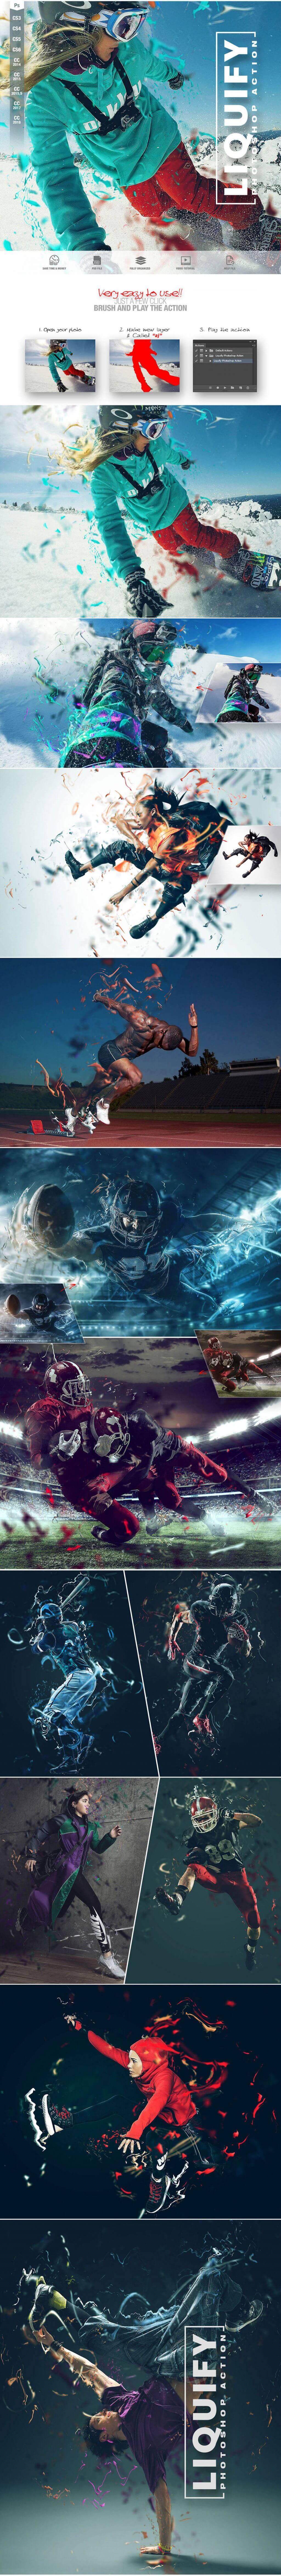 Liquify Photoshop Action CS3 Design